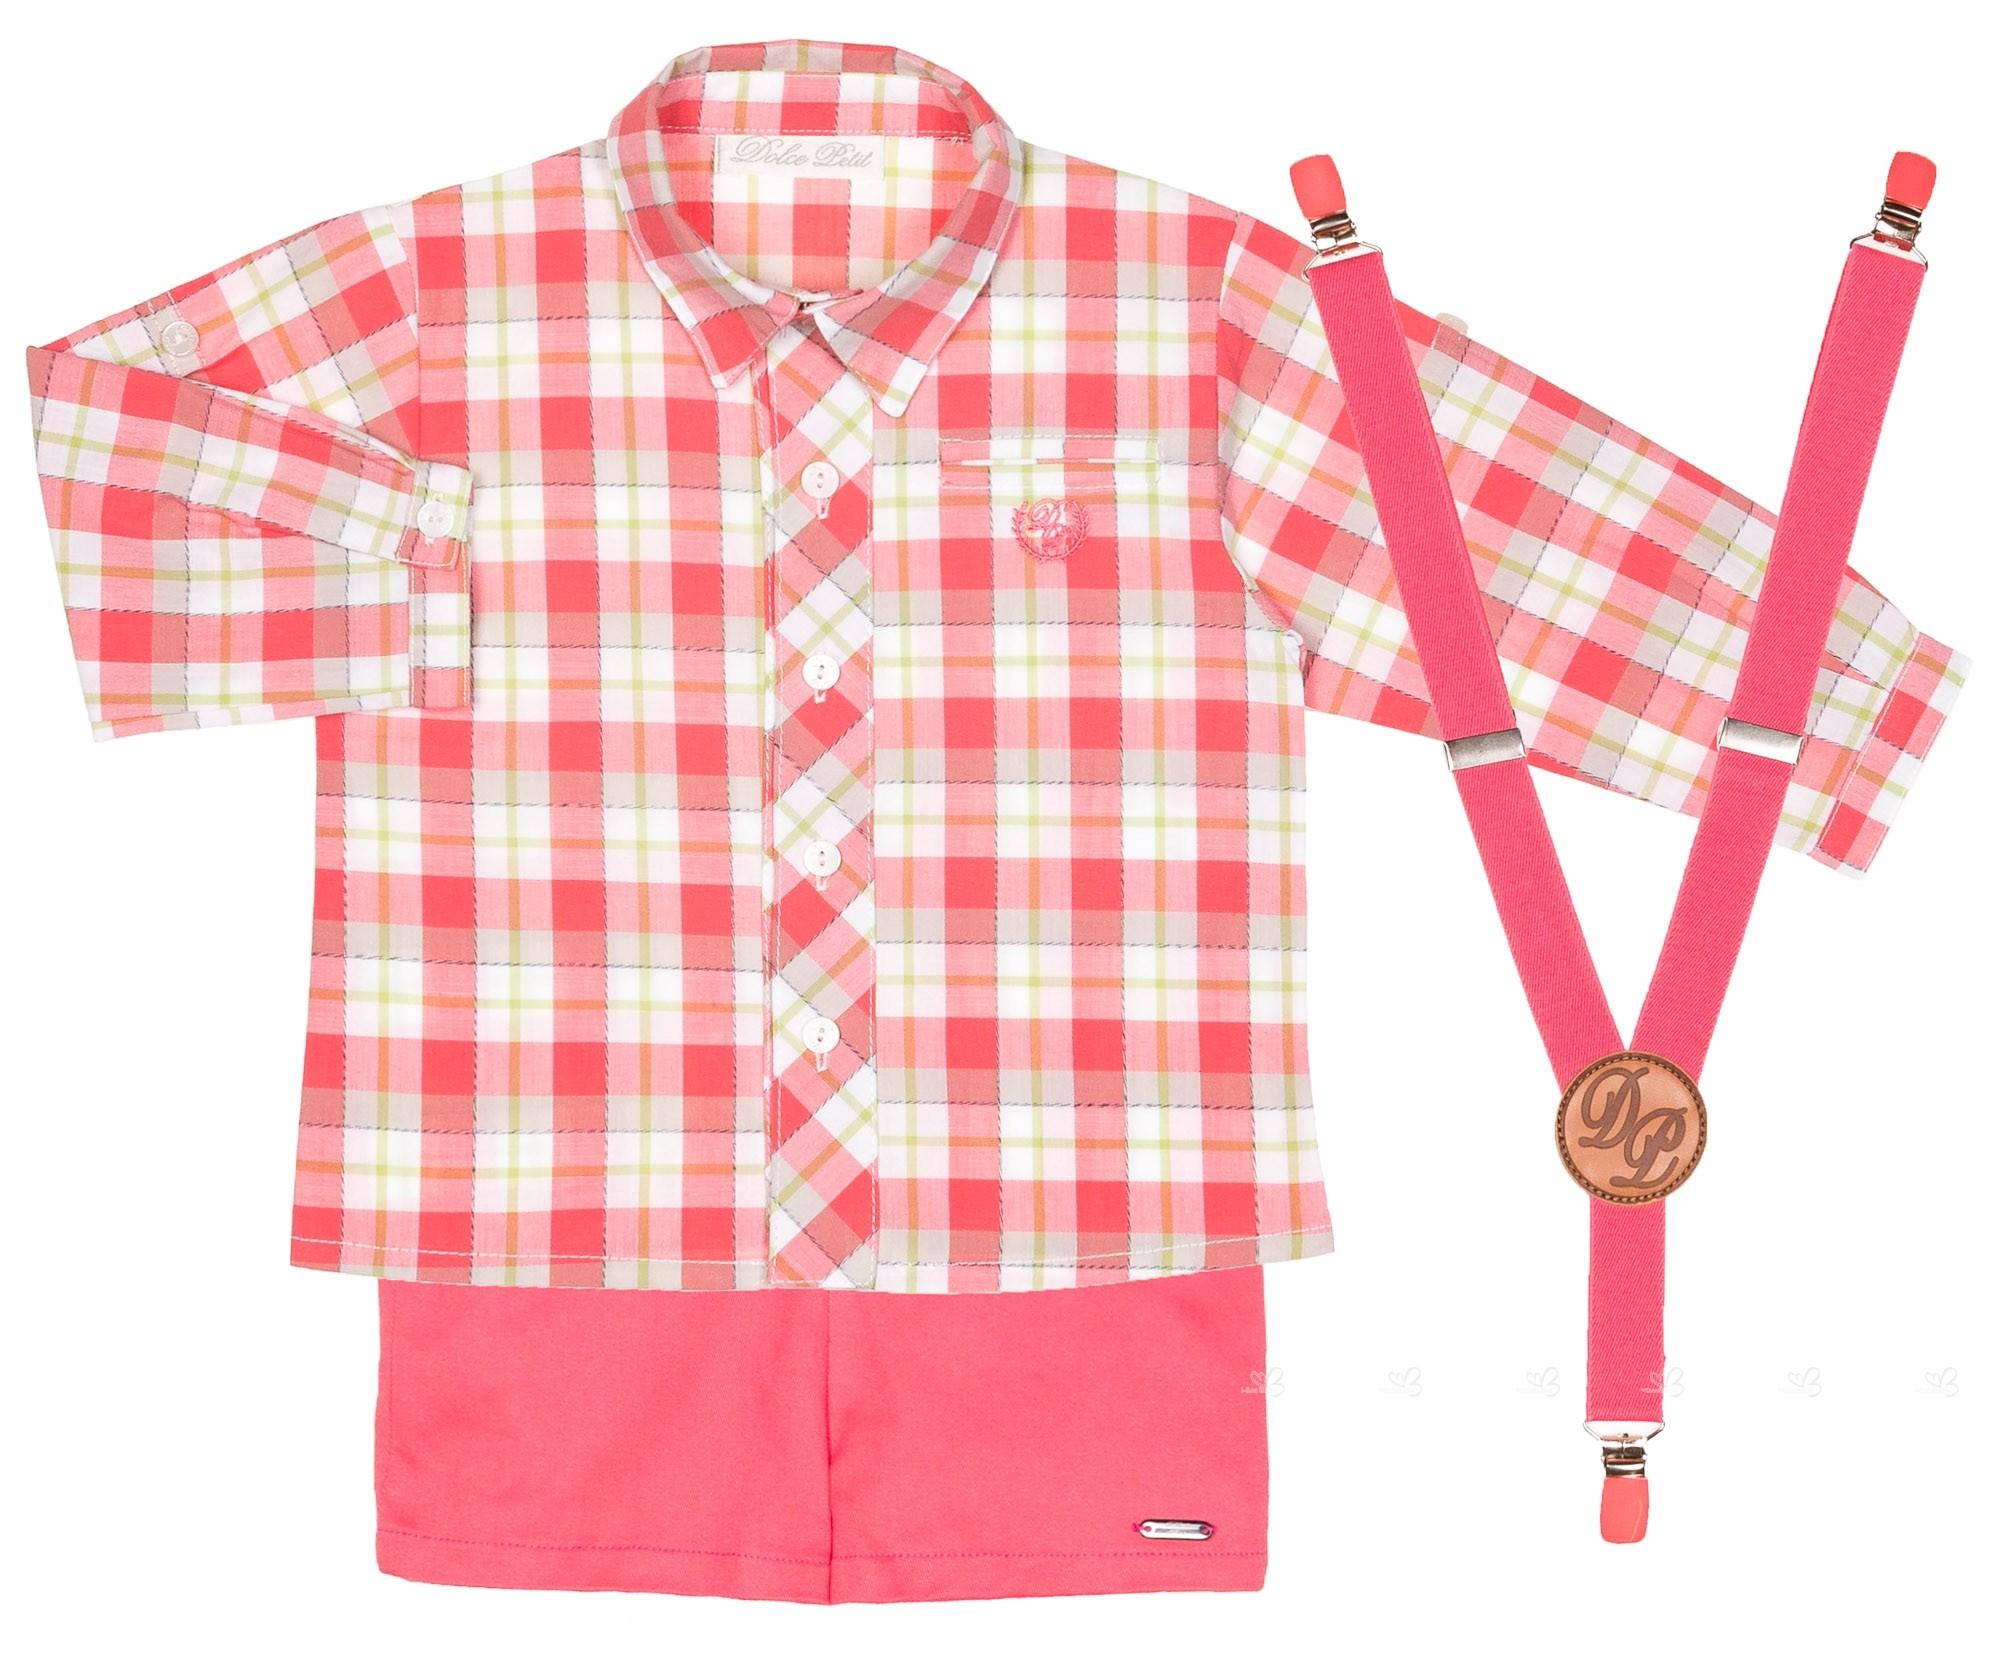 f24a58f54 Home; Baby Boys Coral Pink 3 Piece Shorts Set. Dolce Petit Conjunto Bebé  Niño Coral ...